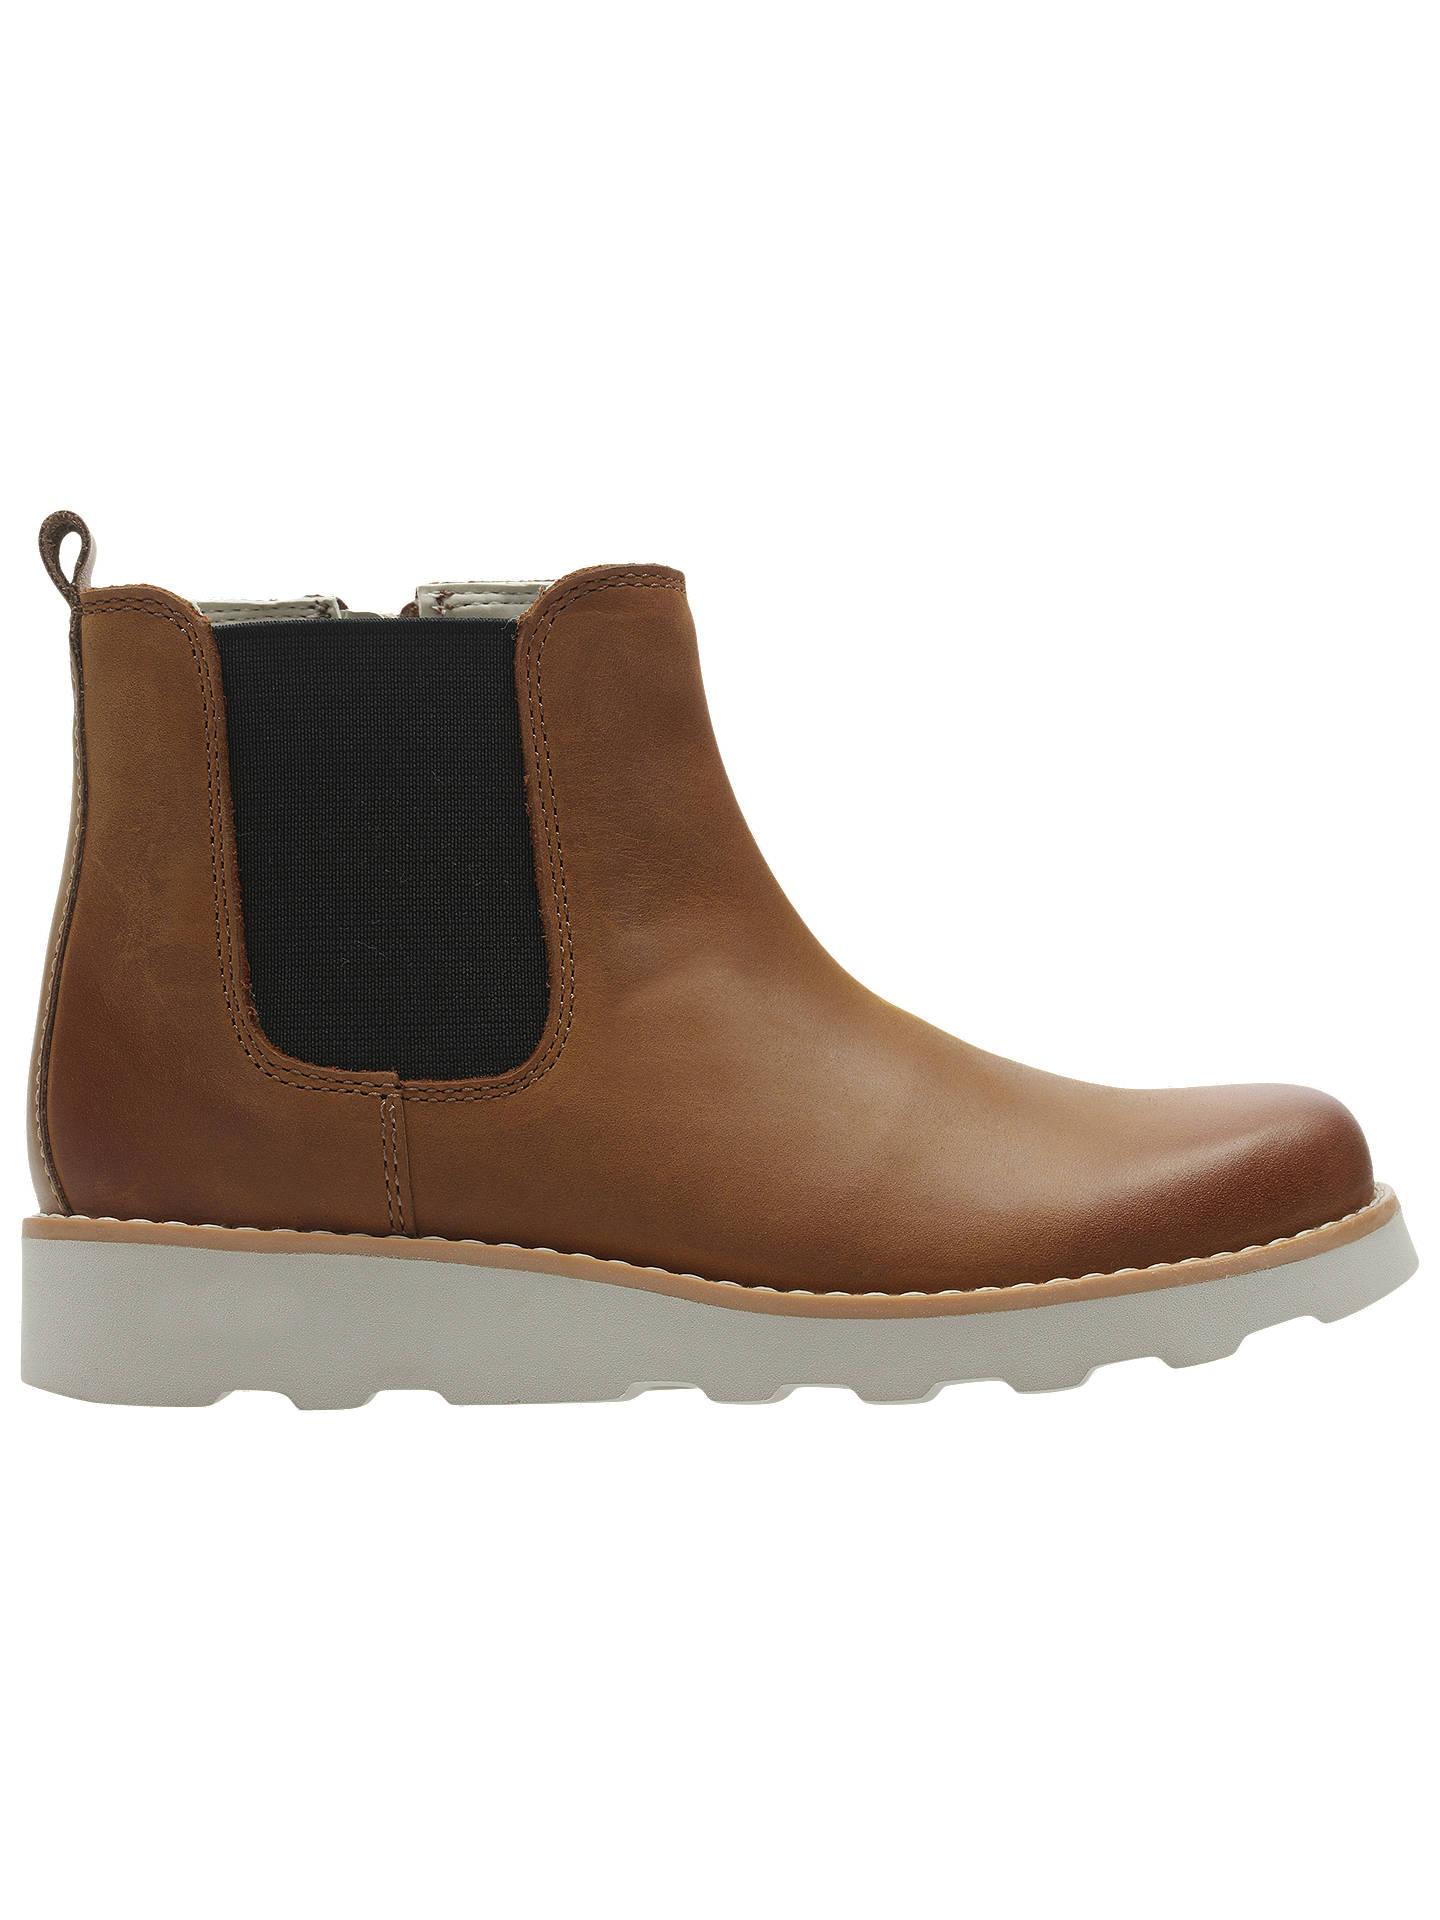 88b591150 Buy Clarks Children's Crown Halo Chelsea Boots, Tan, 10F Jnr Online at  johnlewis.